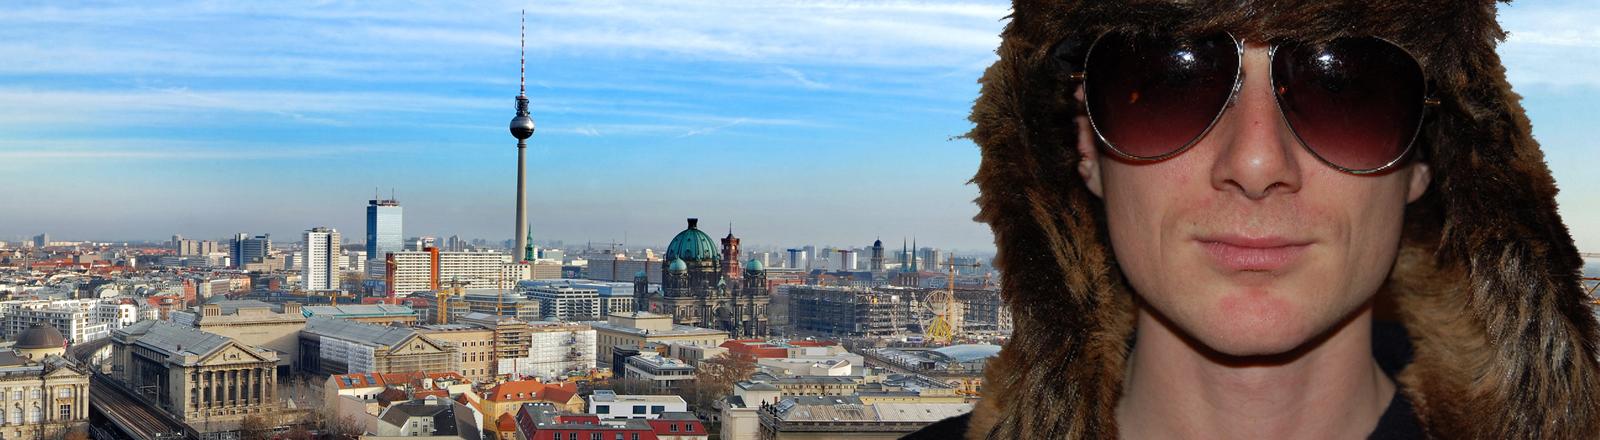 Kristjan Knall vor der Kulisse Berlin.